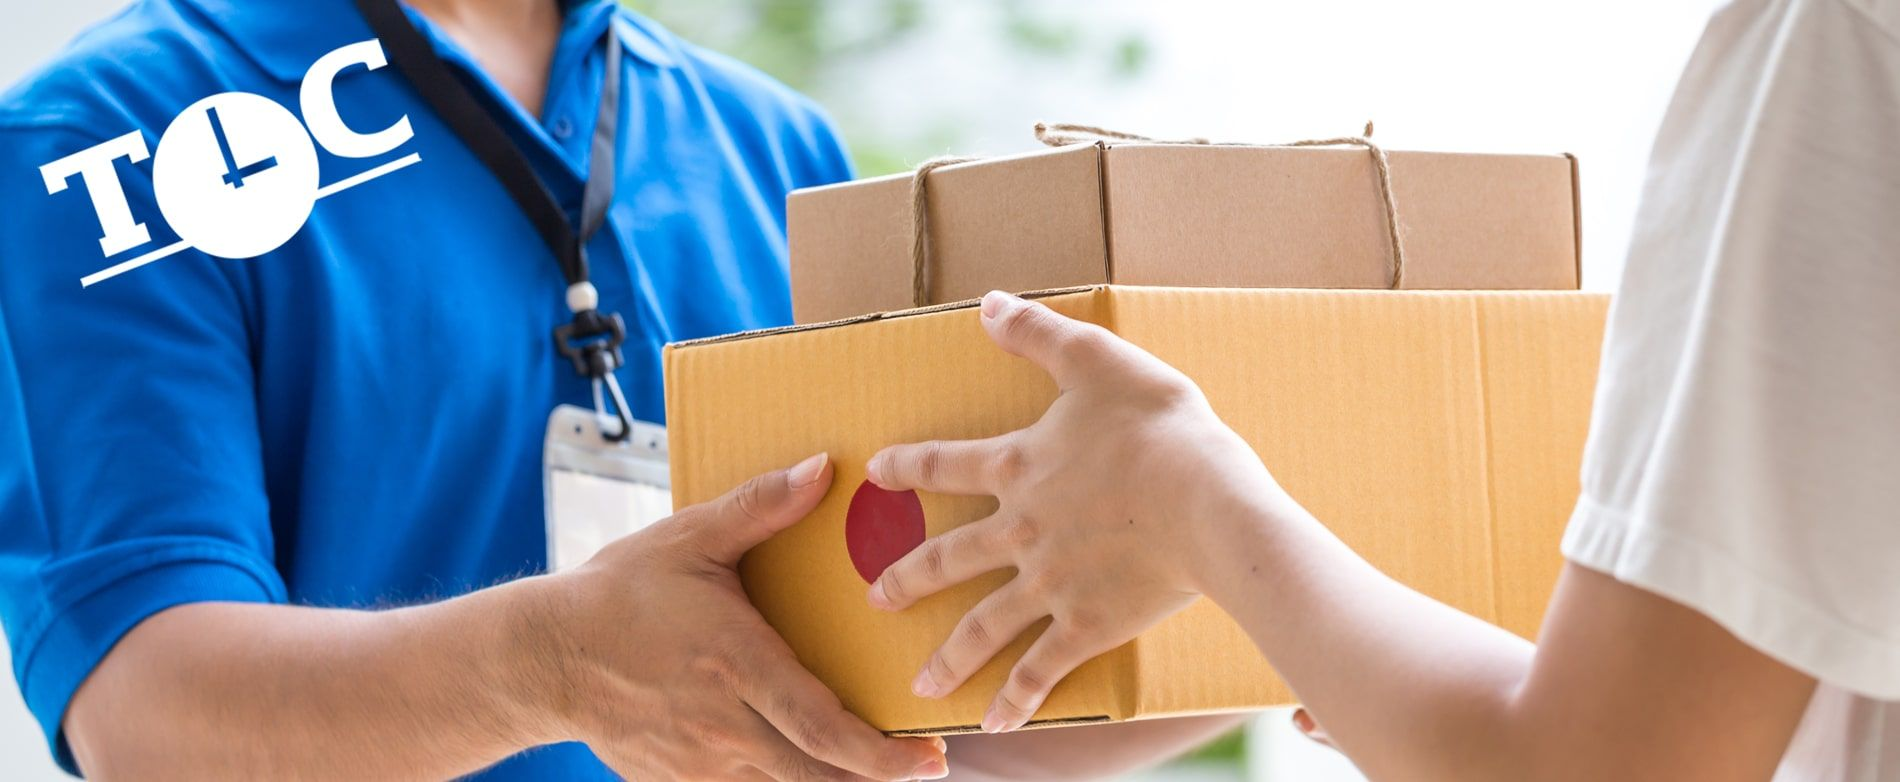 Top Courier ofrece transporte urgente e inmediato para los envíos